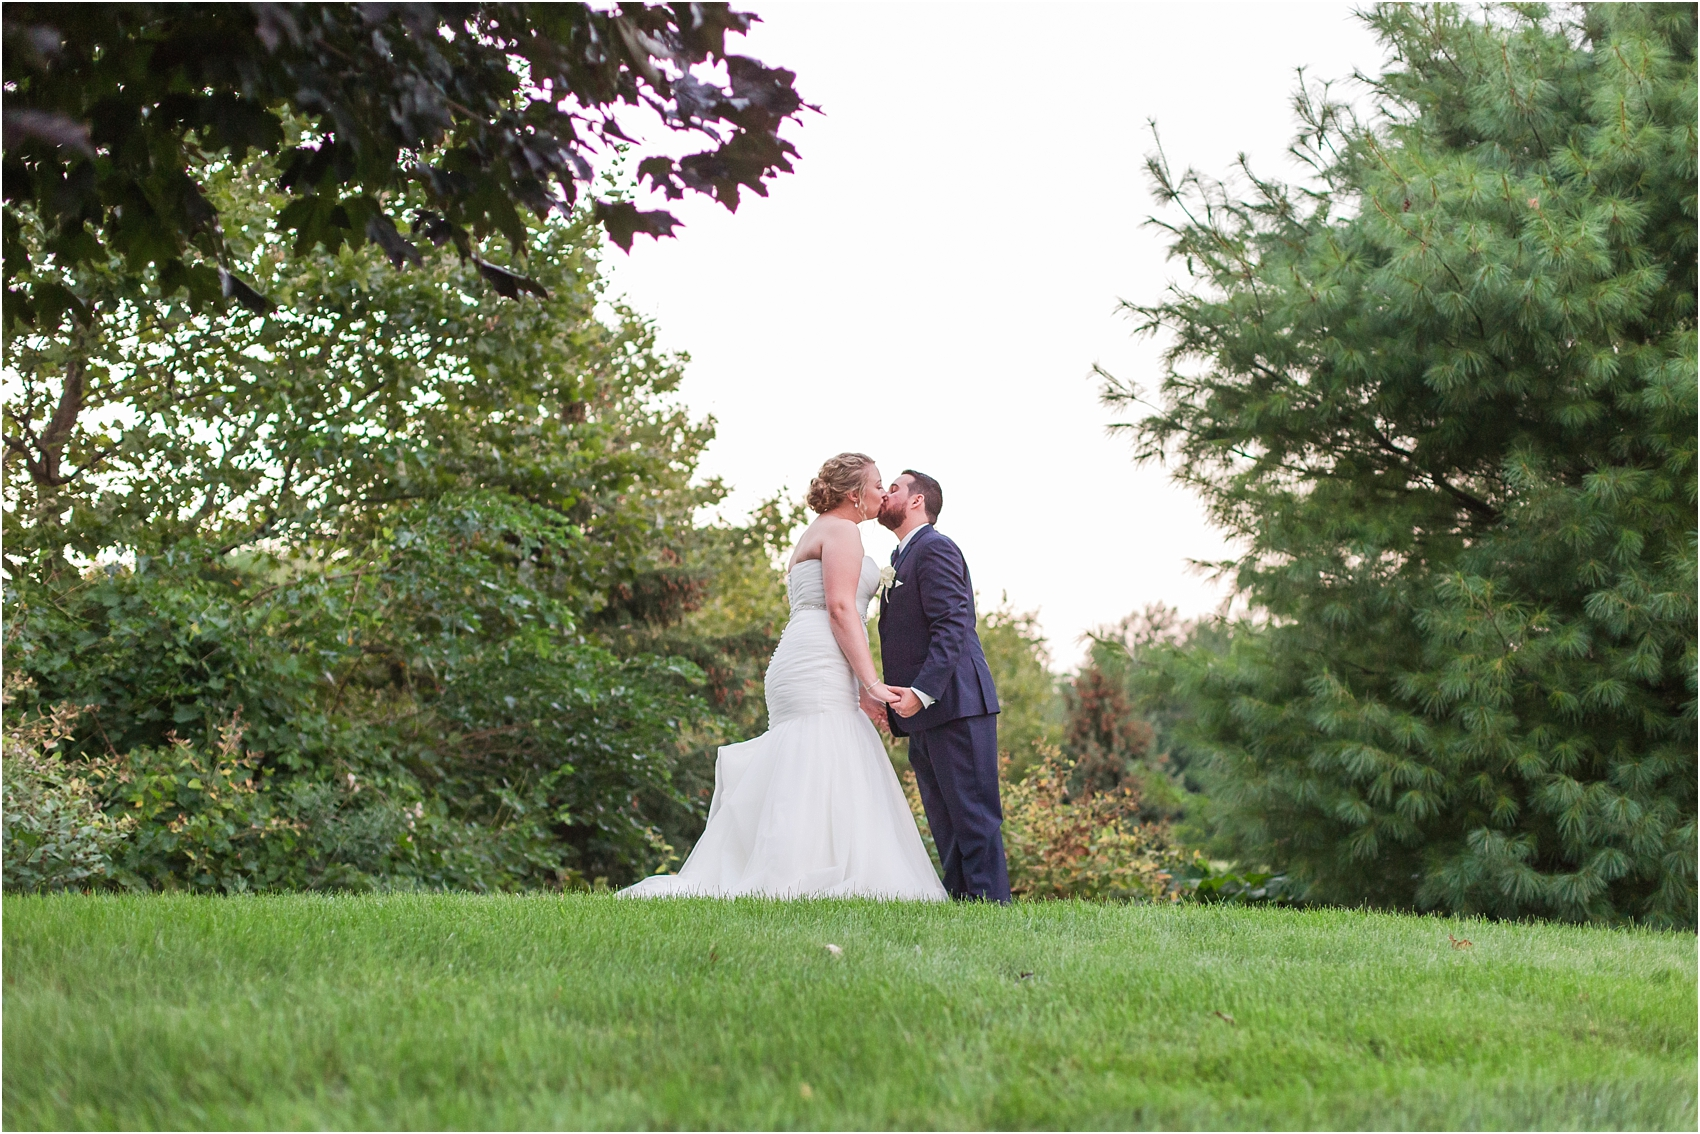 joyful-and-candid-navy-blush-wedding-photos-at-crystal-gardens-in-howell-mi-by-courtney-carolyn-photography_0117.jpg